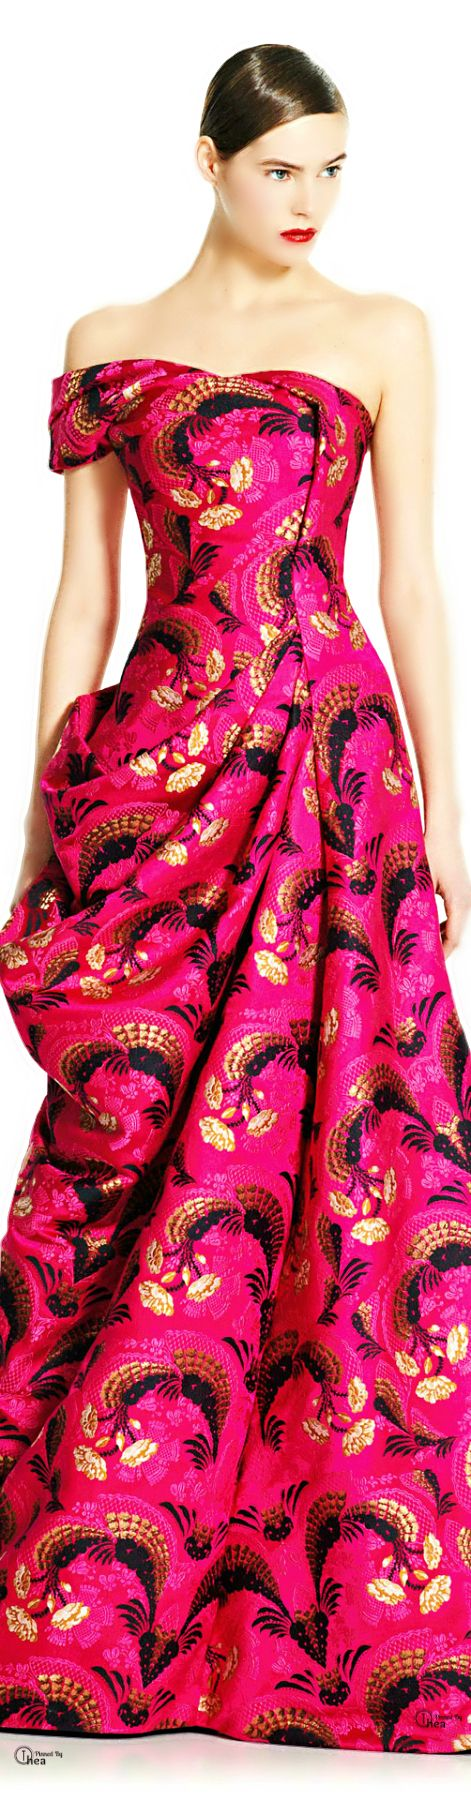 Alexander McQueen ~ Fall One Shoulder Fit Flare Multi Color Print Maxi Dress 2012